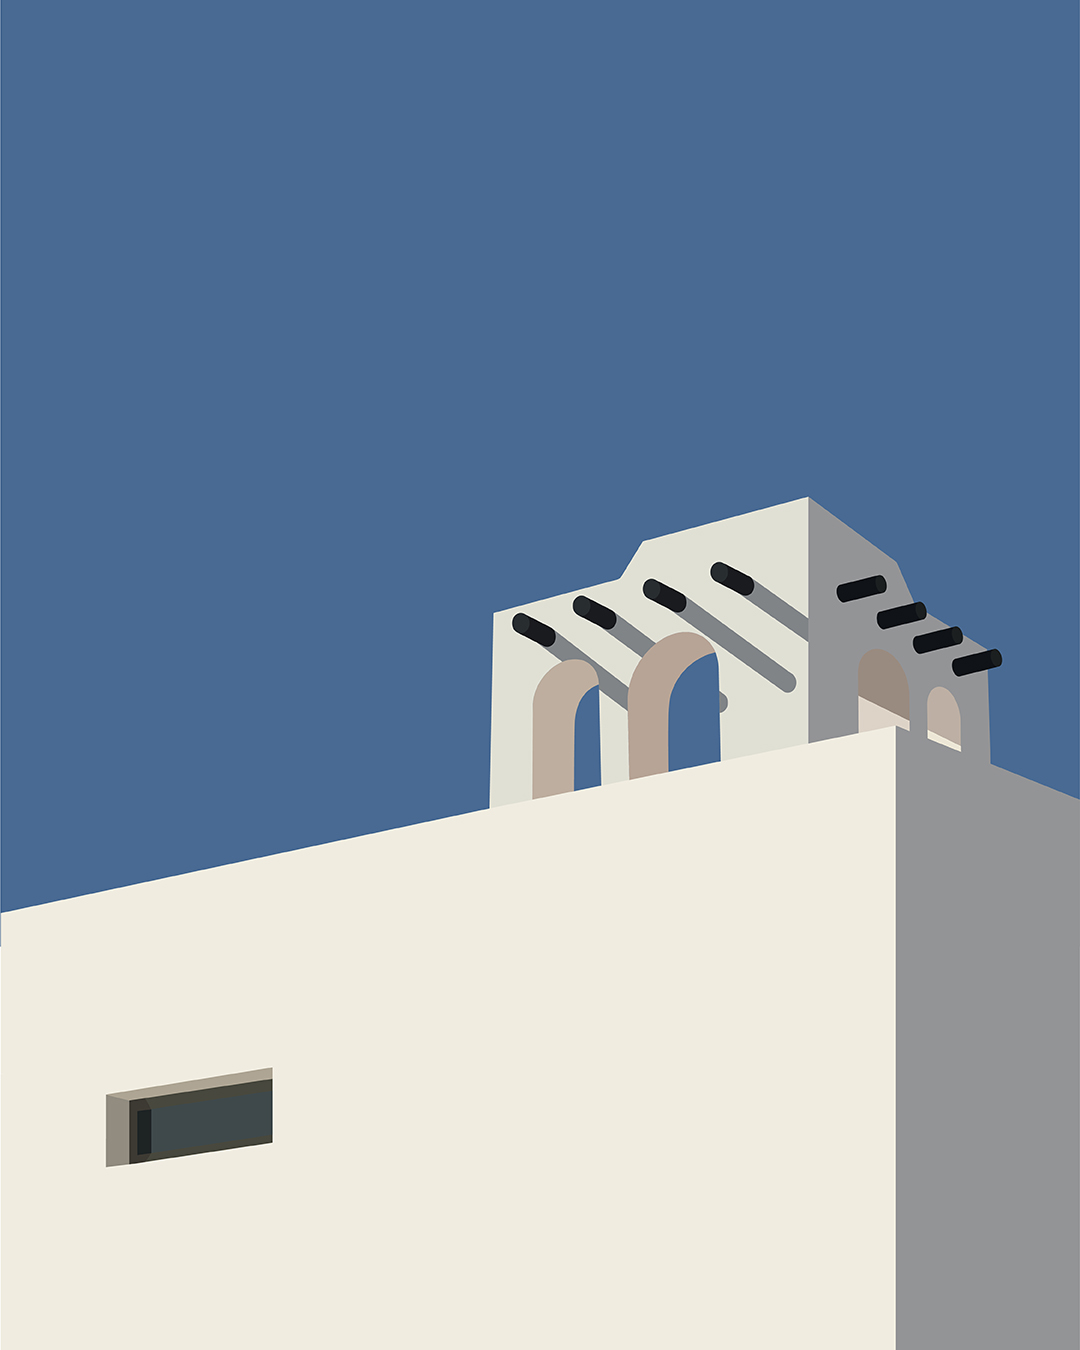 EvelinToledano_House.jpg